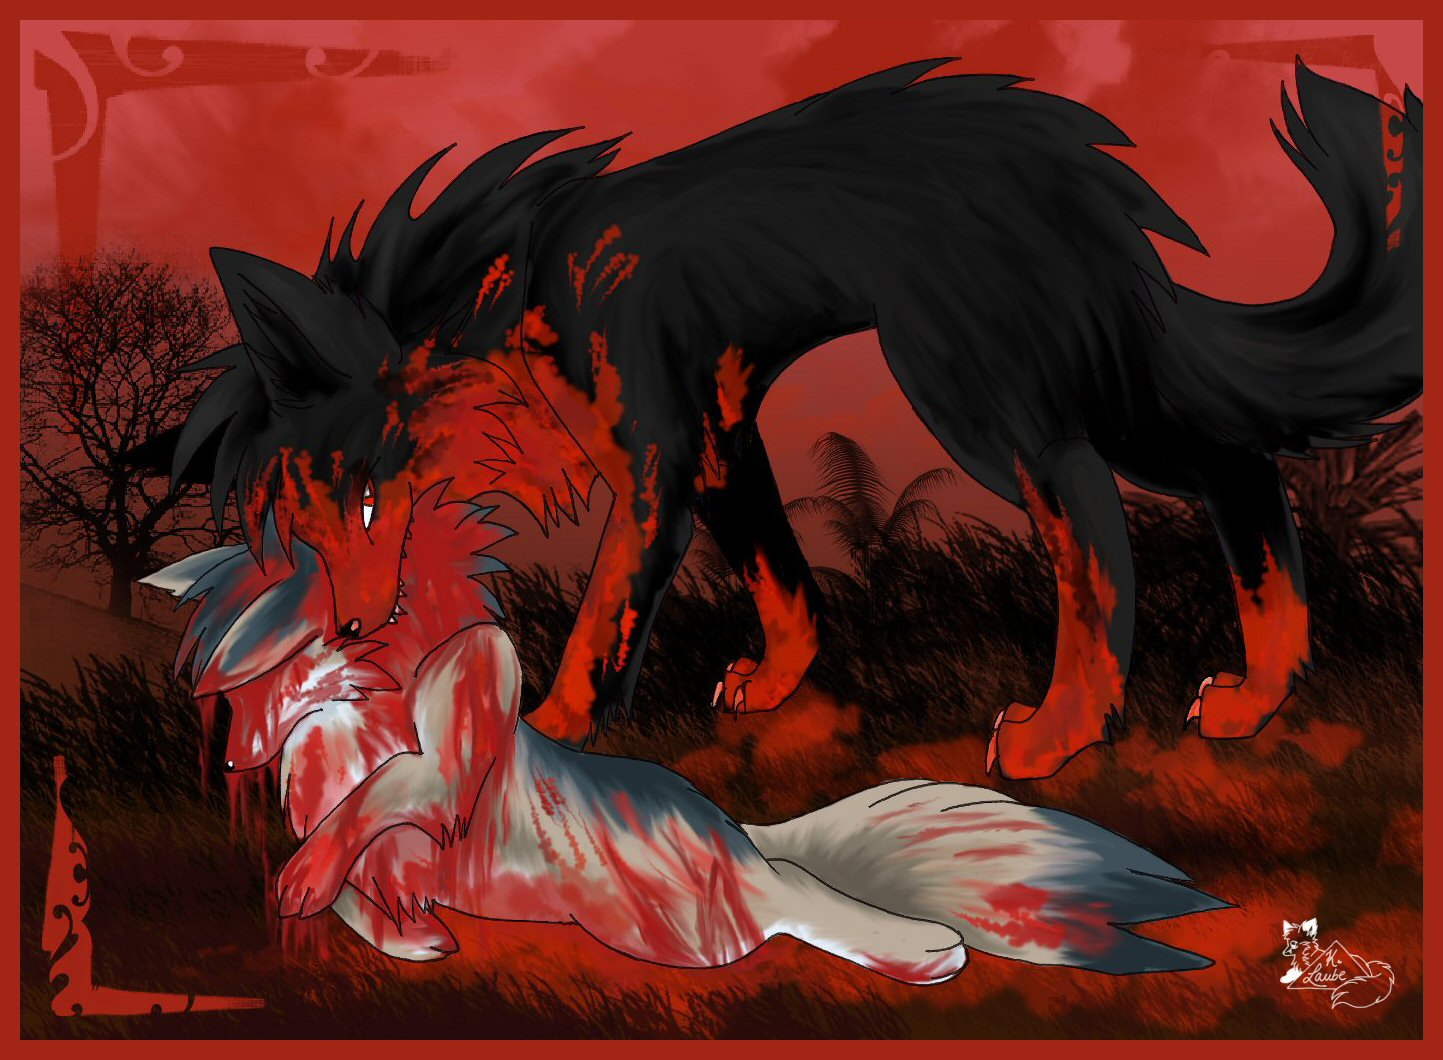 Kill_the_wolf_by_Pharaonenfuchs.jpg